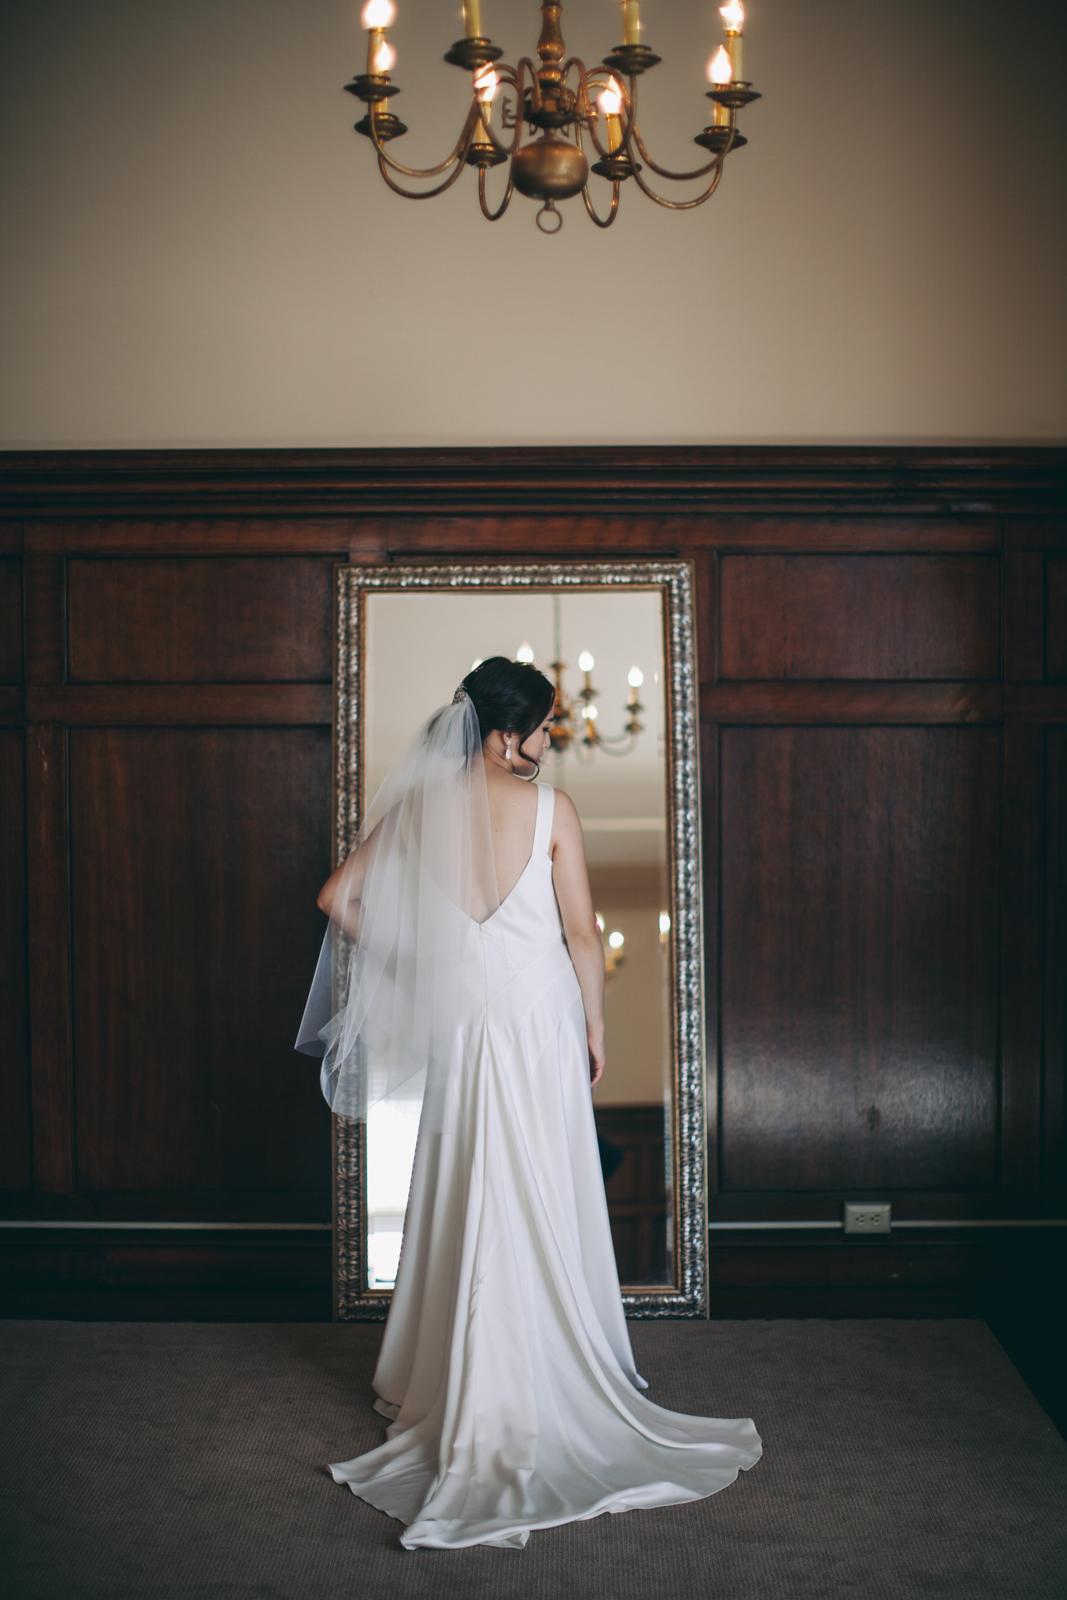 kohl_manison_wedding_photography_sarah_eric_ebony_siovhan_bokeh_photography_012.jpg